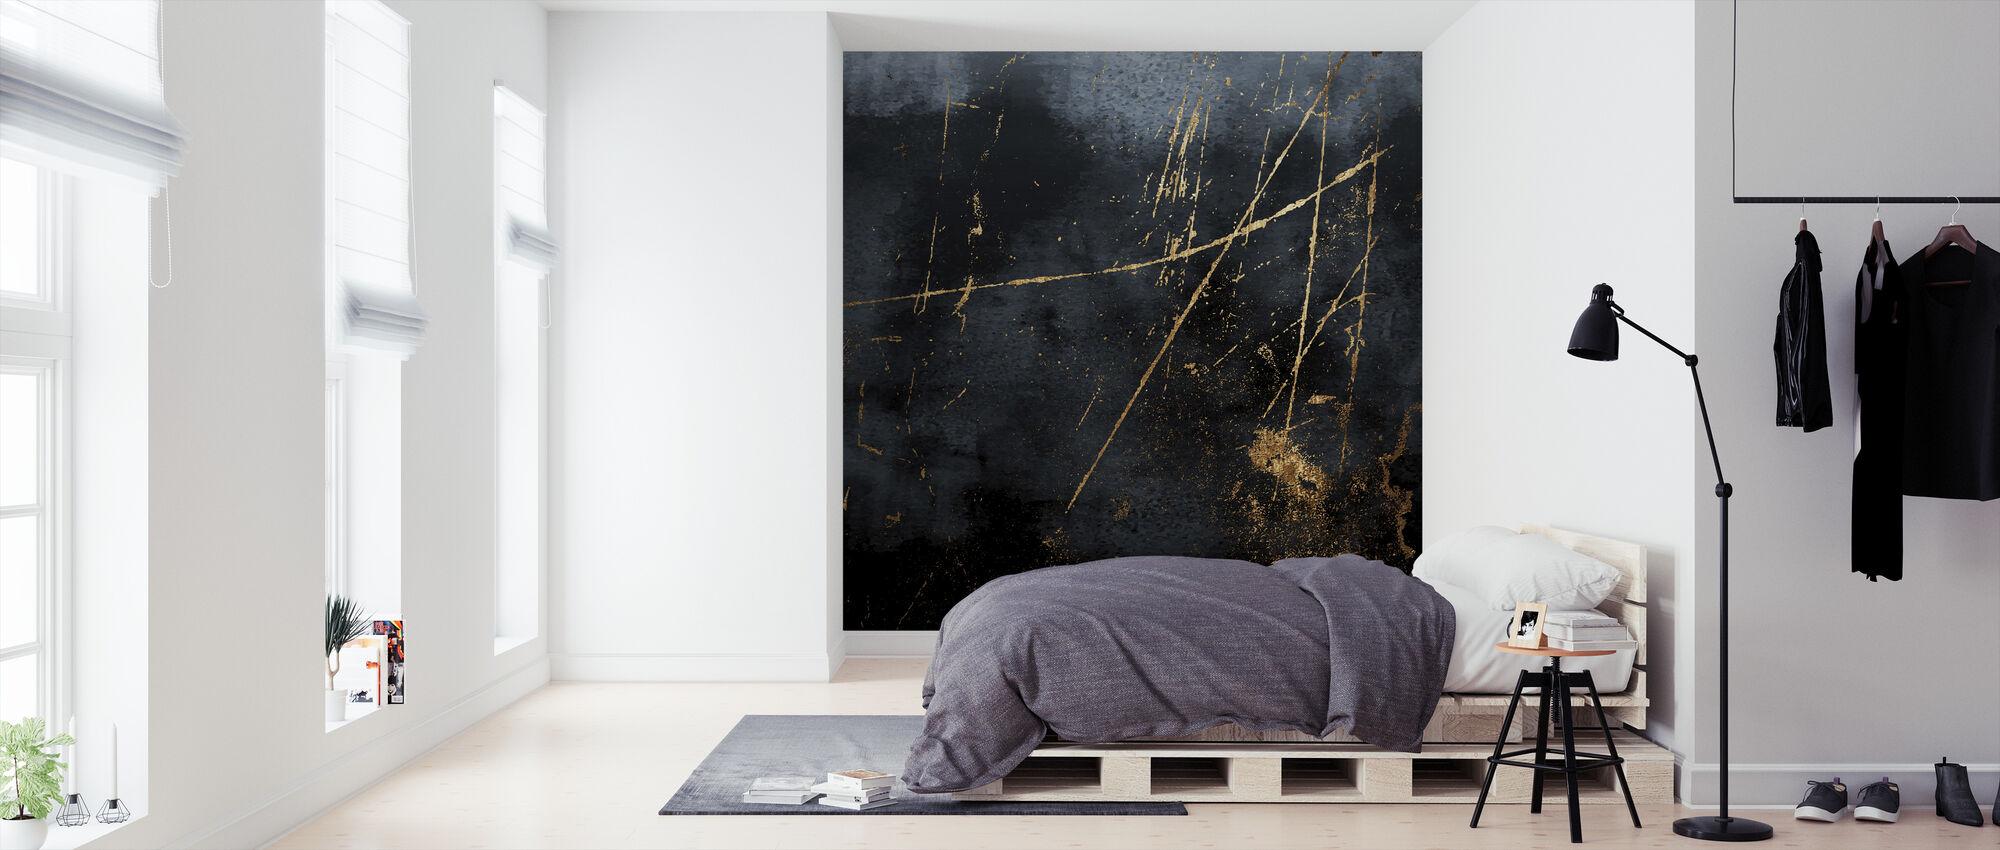 Saffier - Behang - Slaapkamer